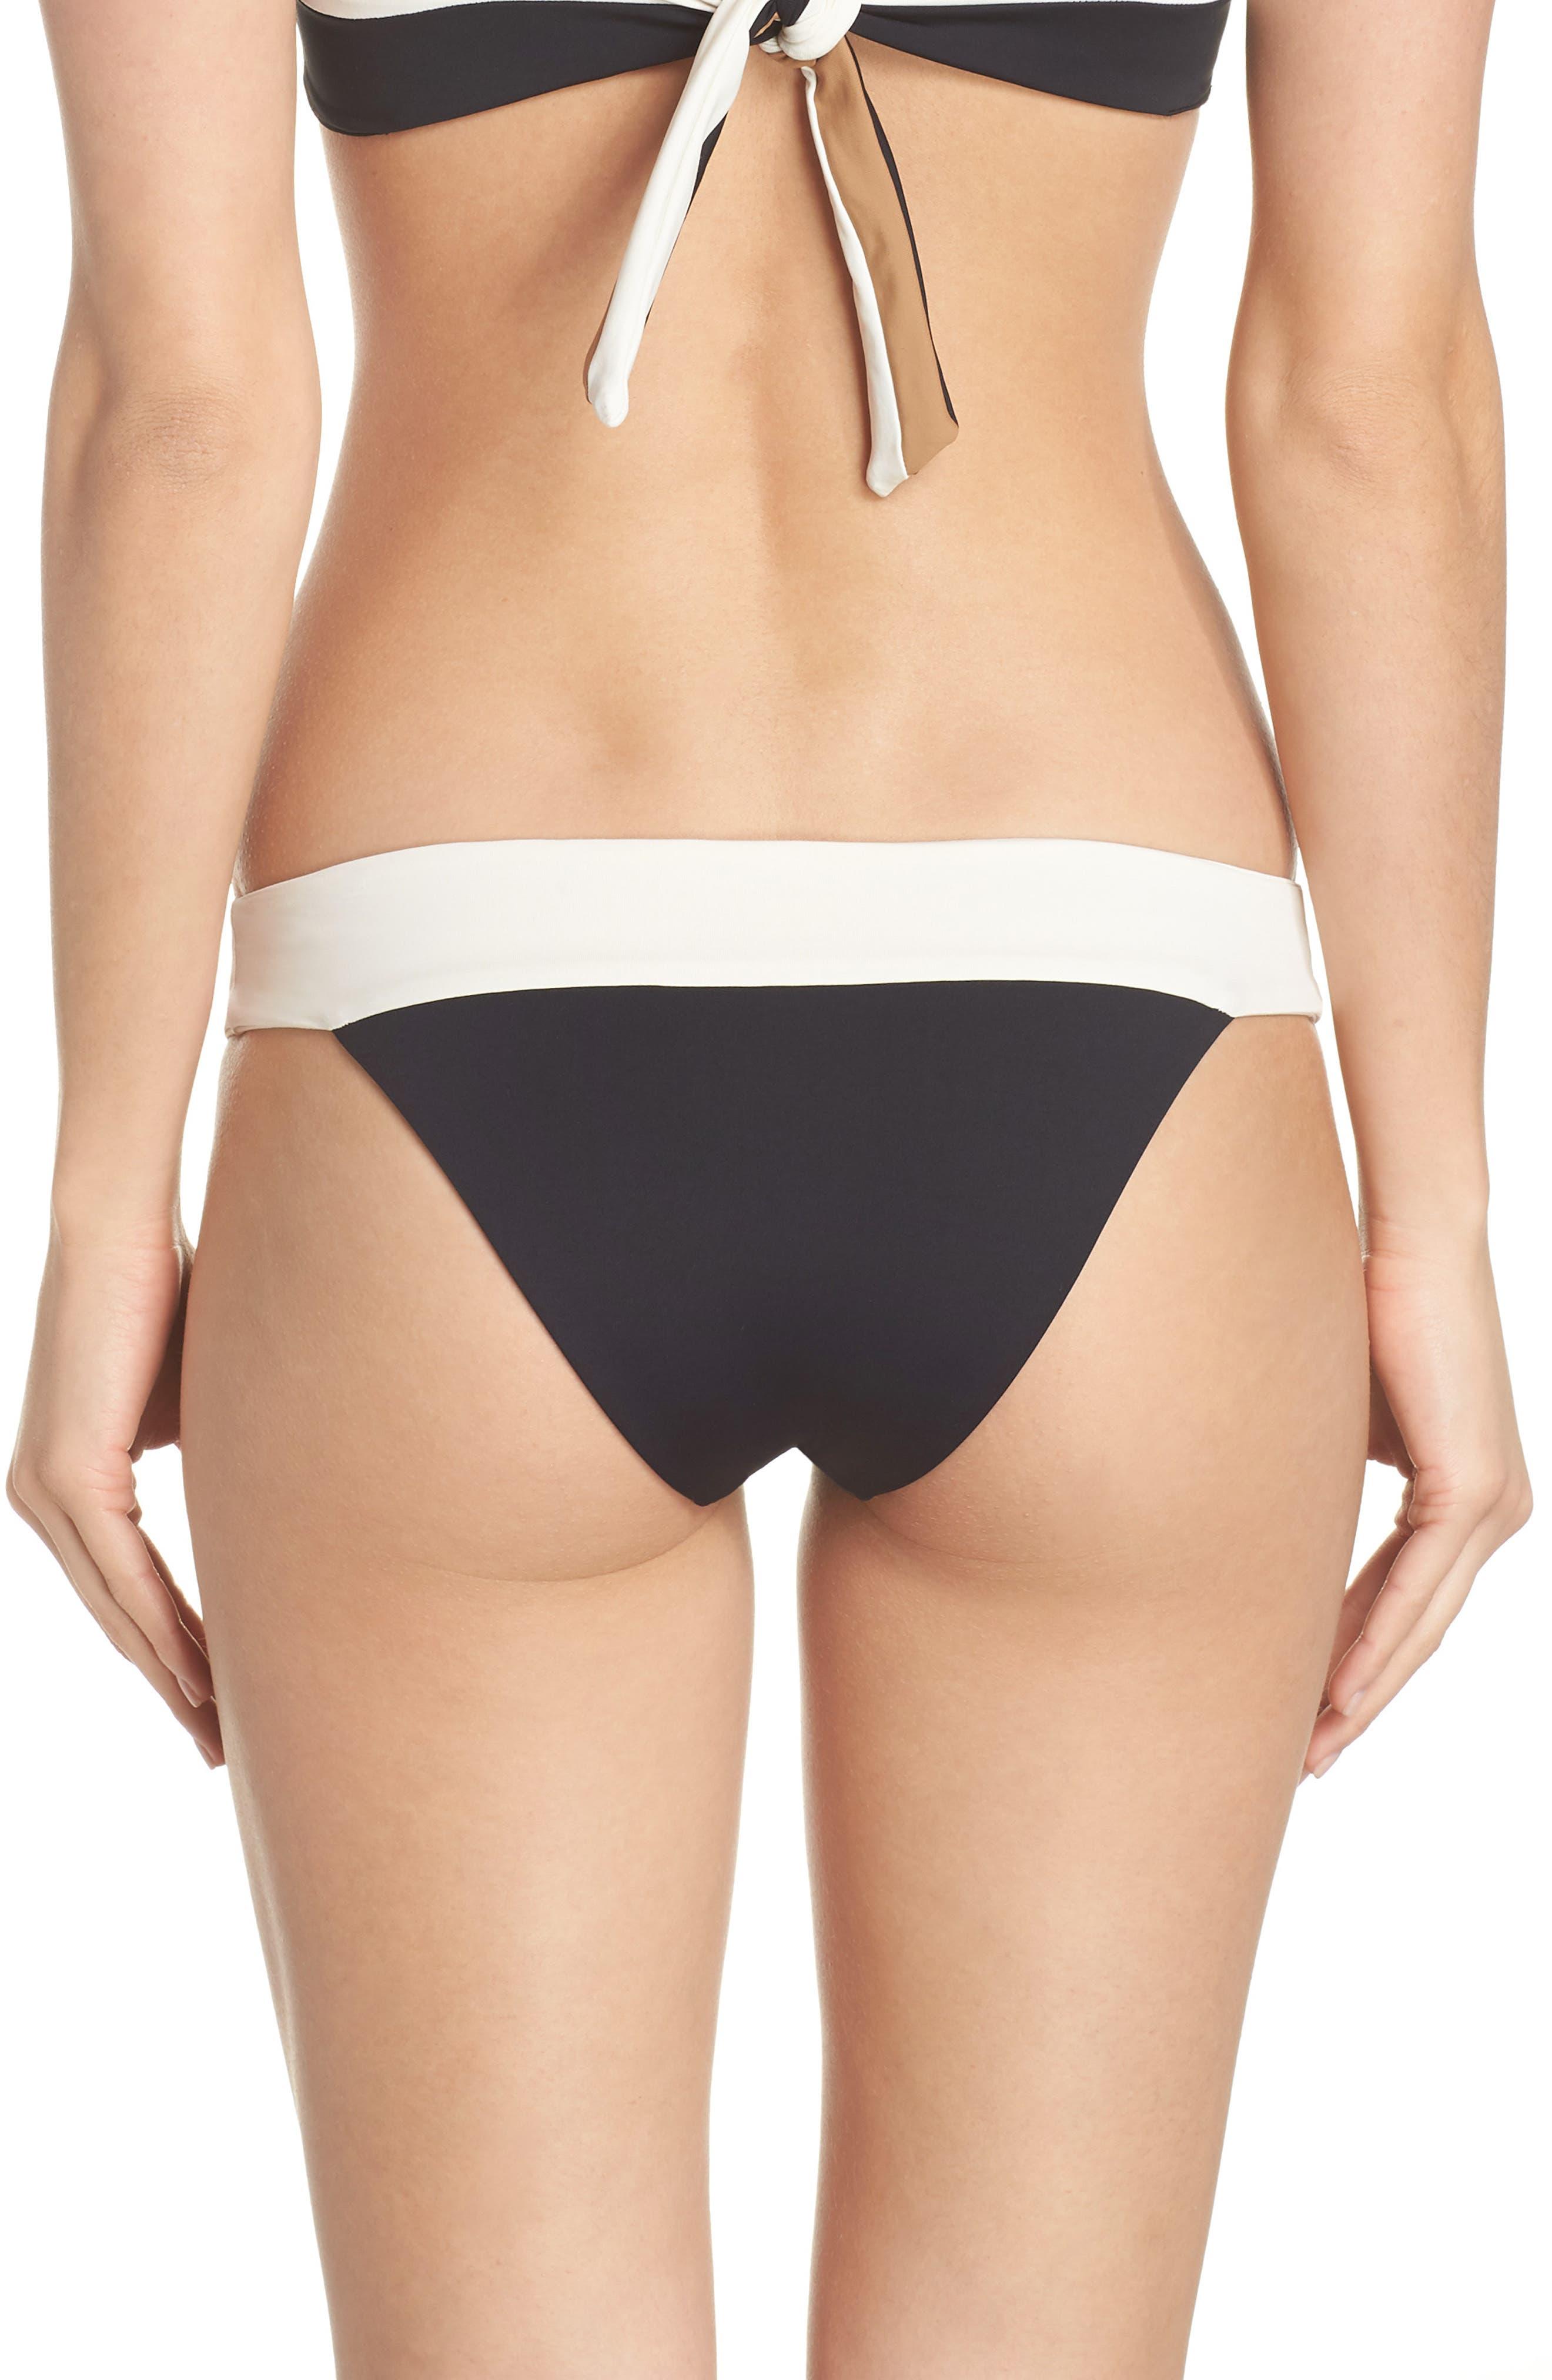 Reversible Bikini Bottom,                             Alternate thumbnail 2, color,                             CREAM/ BLACK/ CAMEL